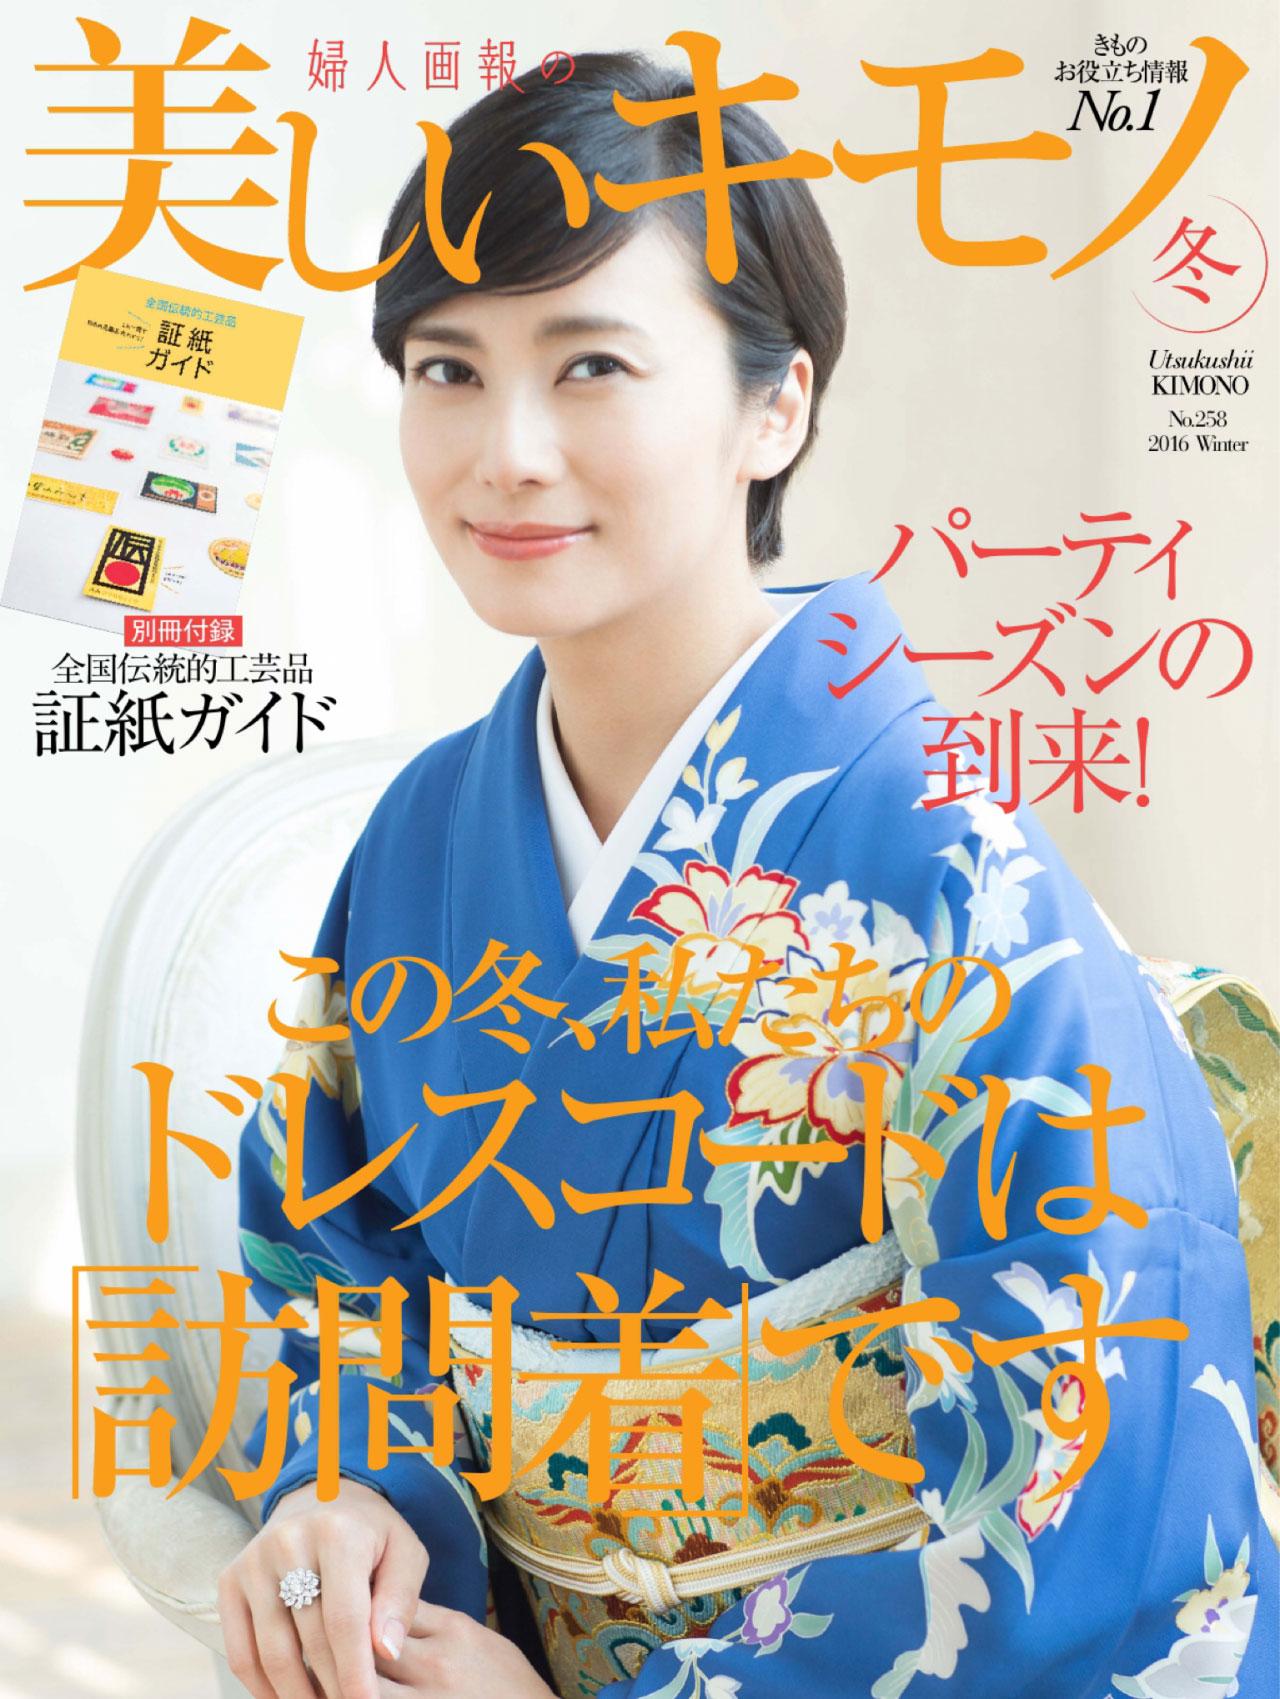 Ko Shibasaki Japanese Utsukushii Kimono Magazine